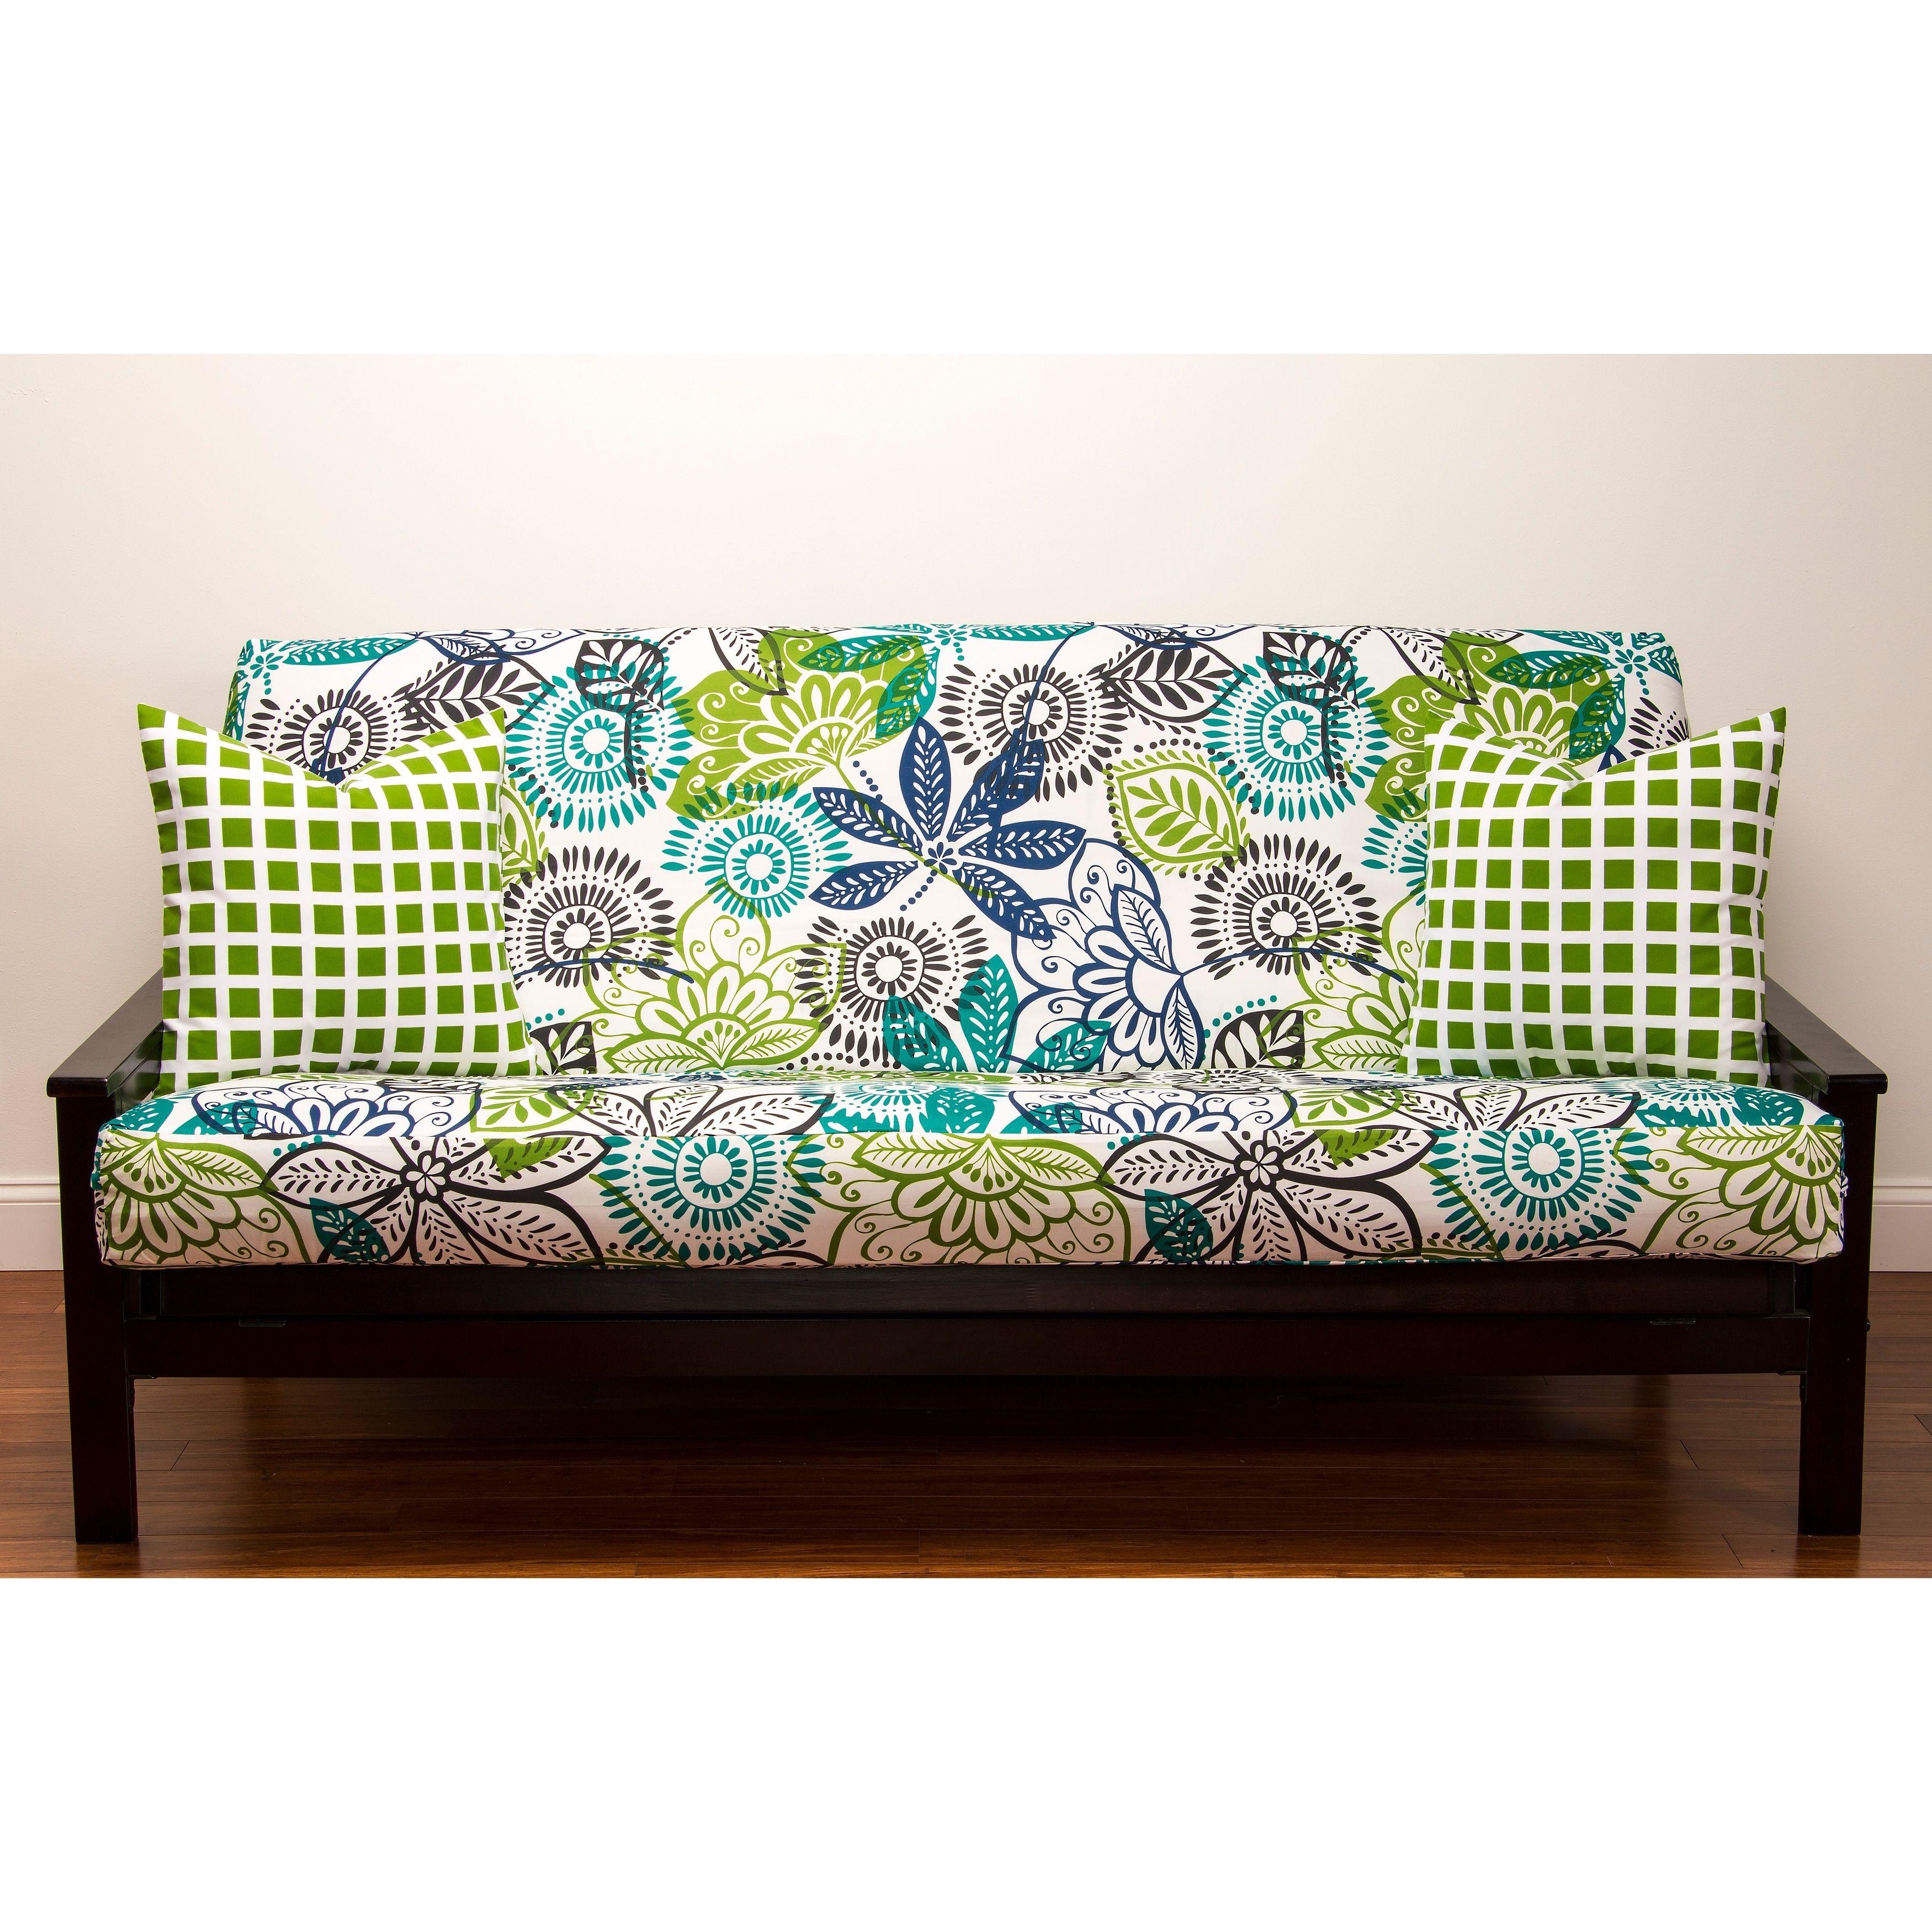 SIScovers Batik Print Fullsize Futon Cover Products Pinterest